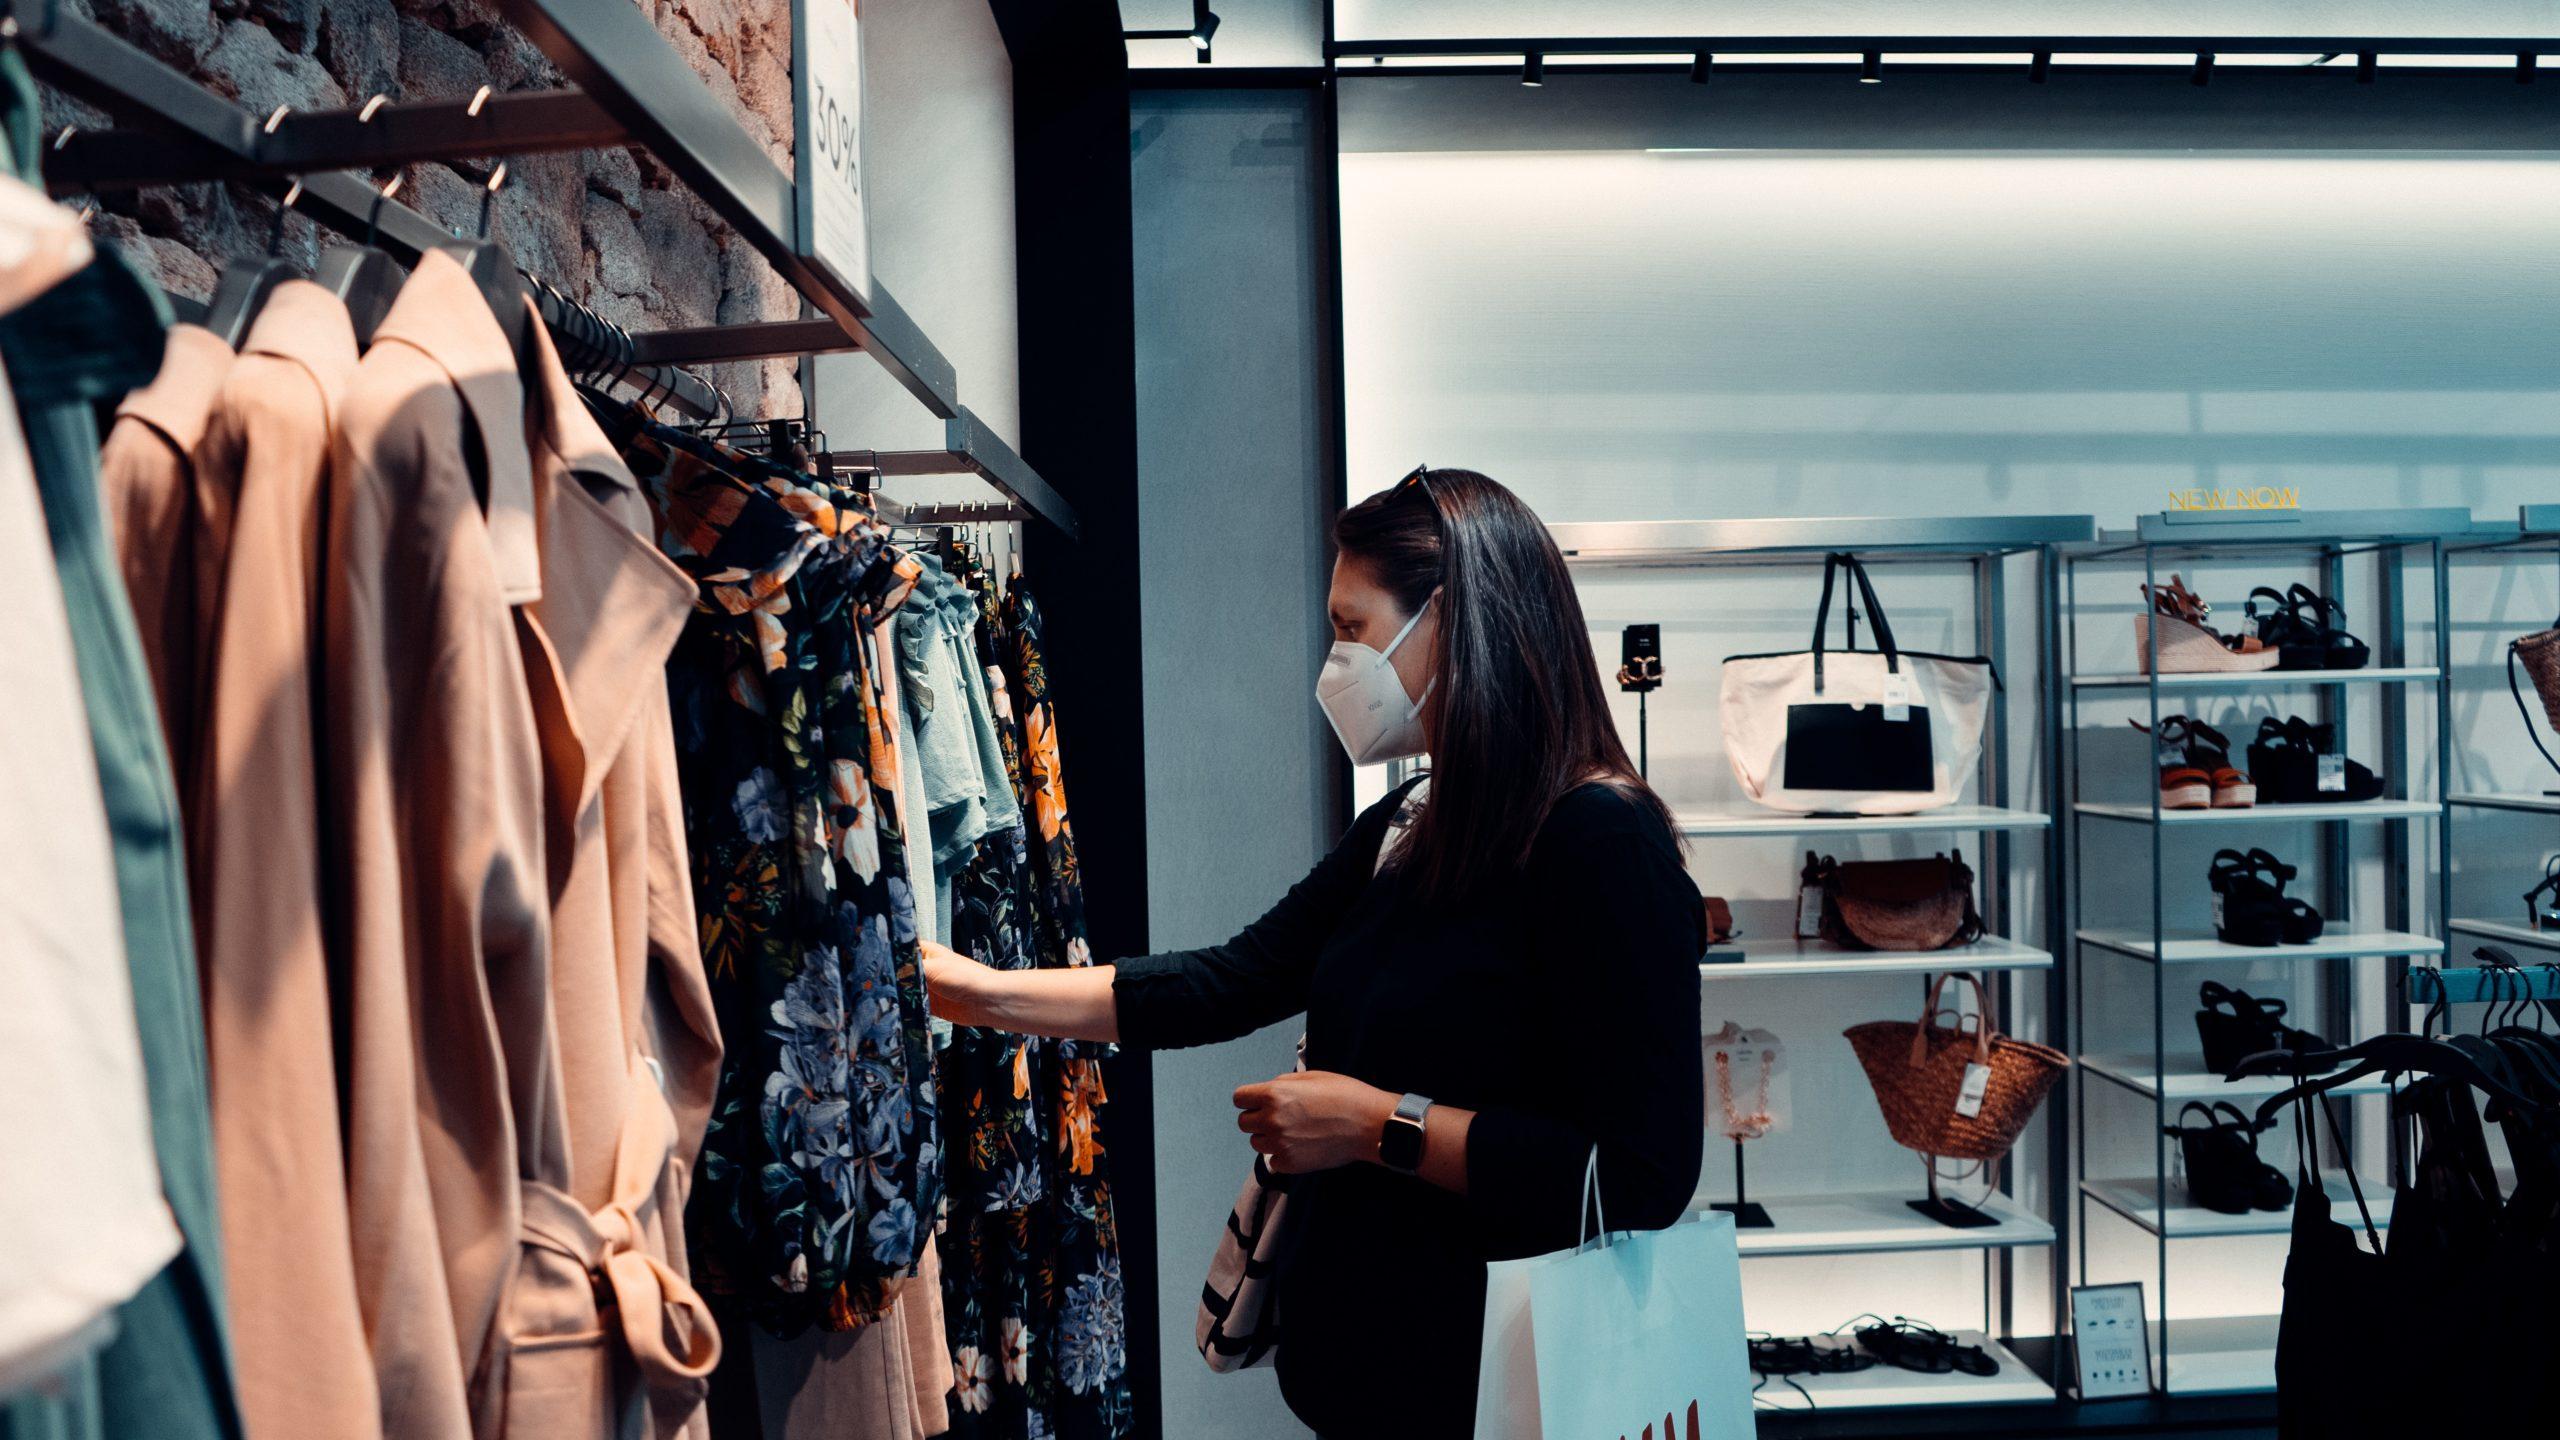 Bringing Back Consumer Confidence in the COVID-Era